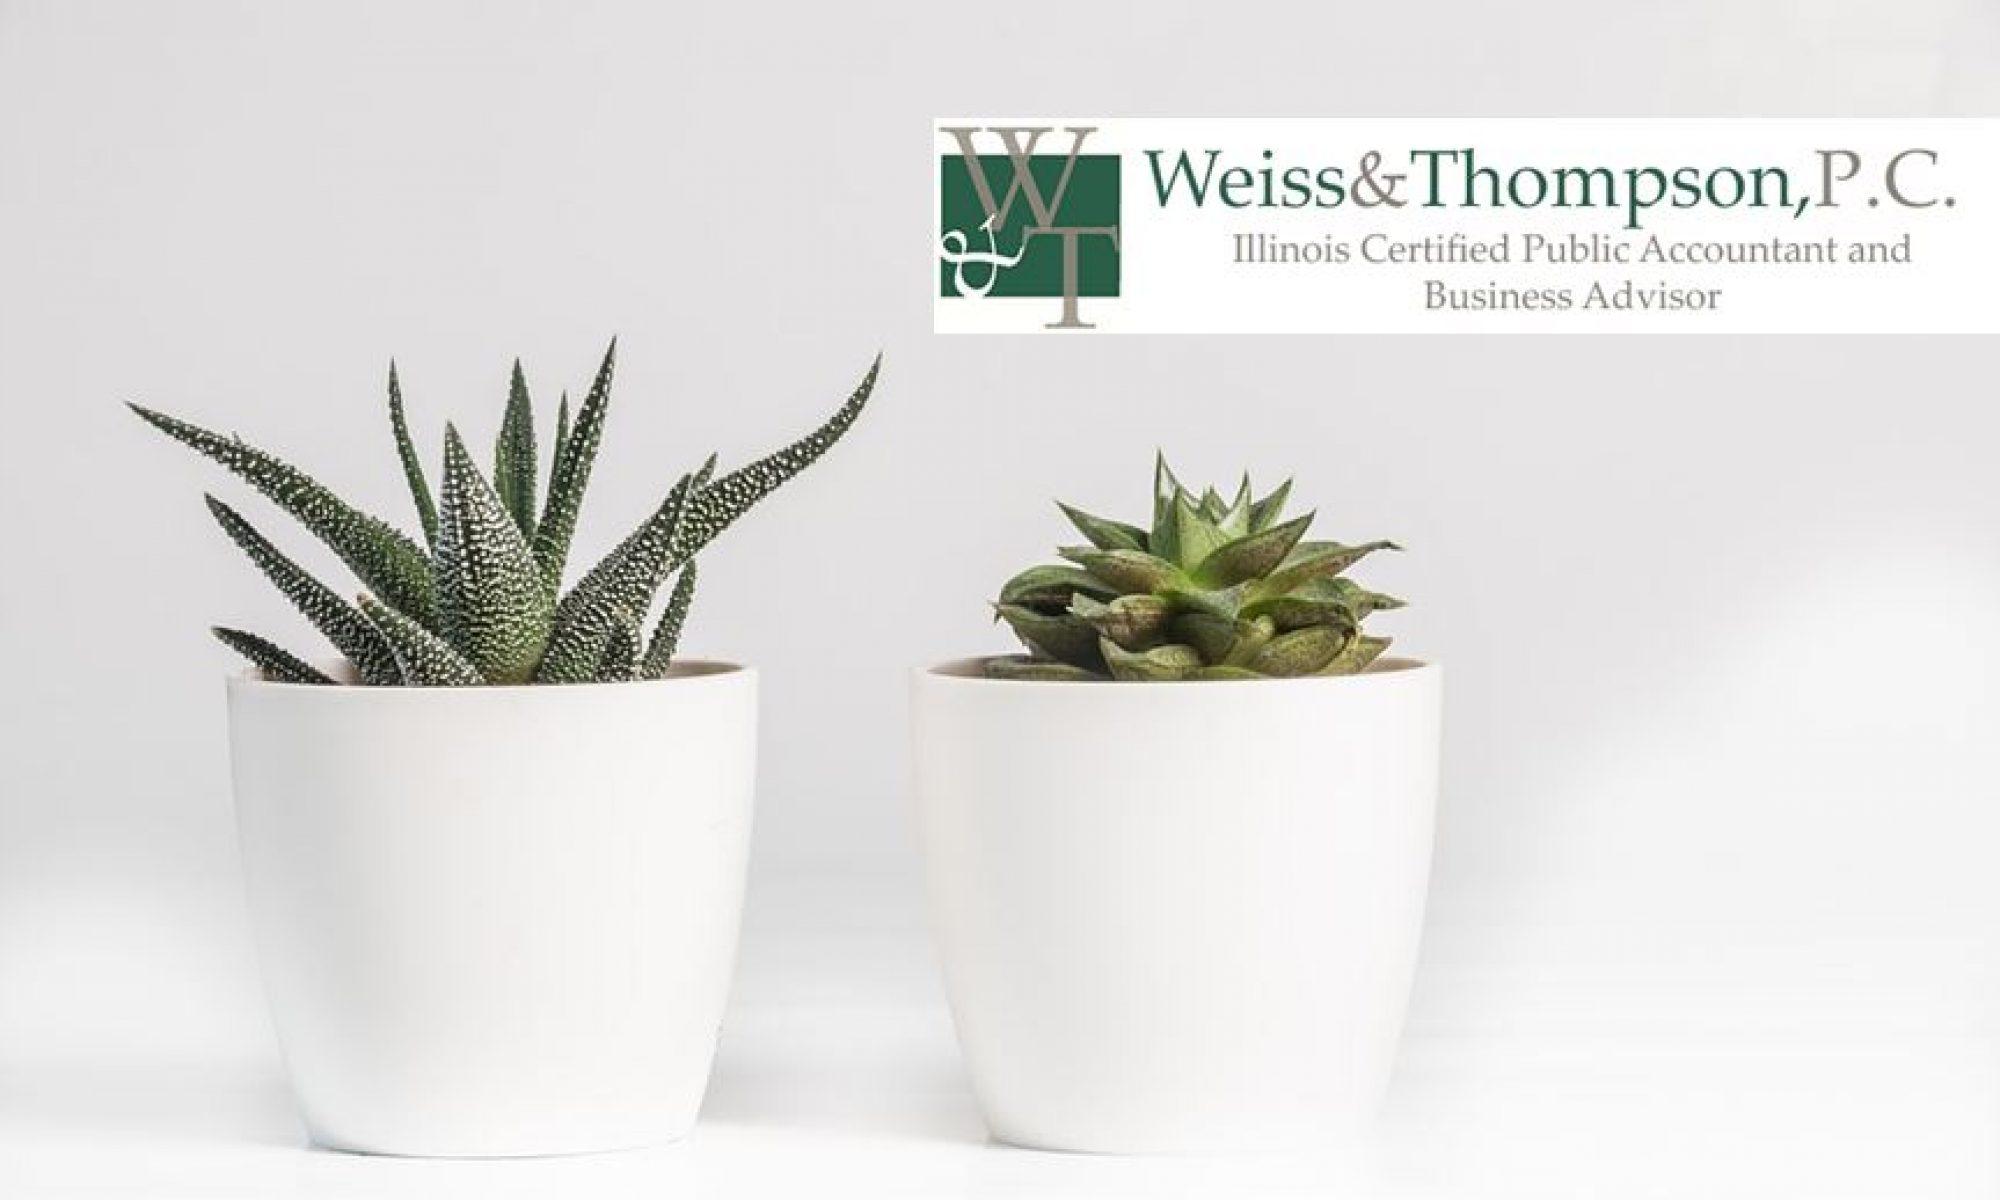 Weiss & Thompson, P.C.